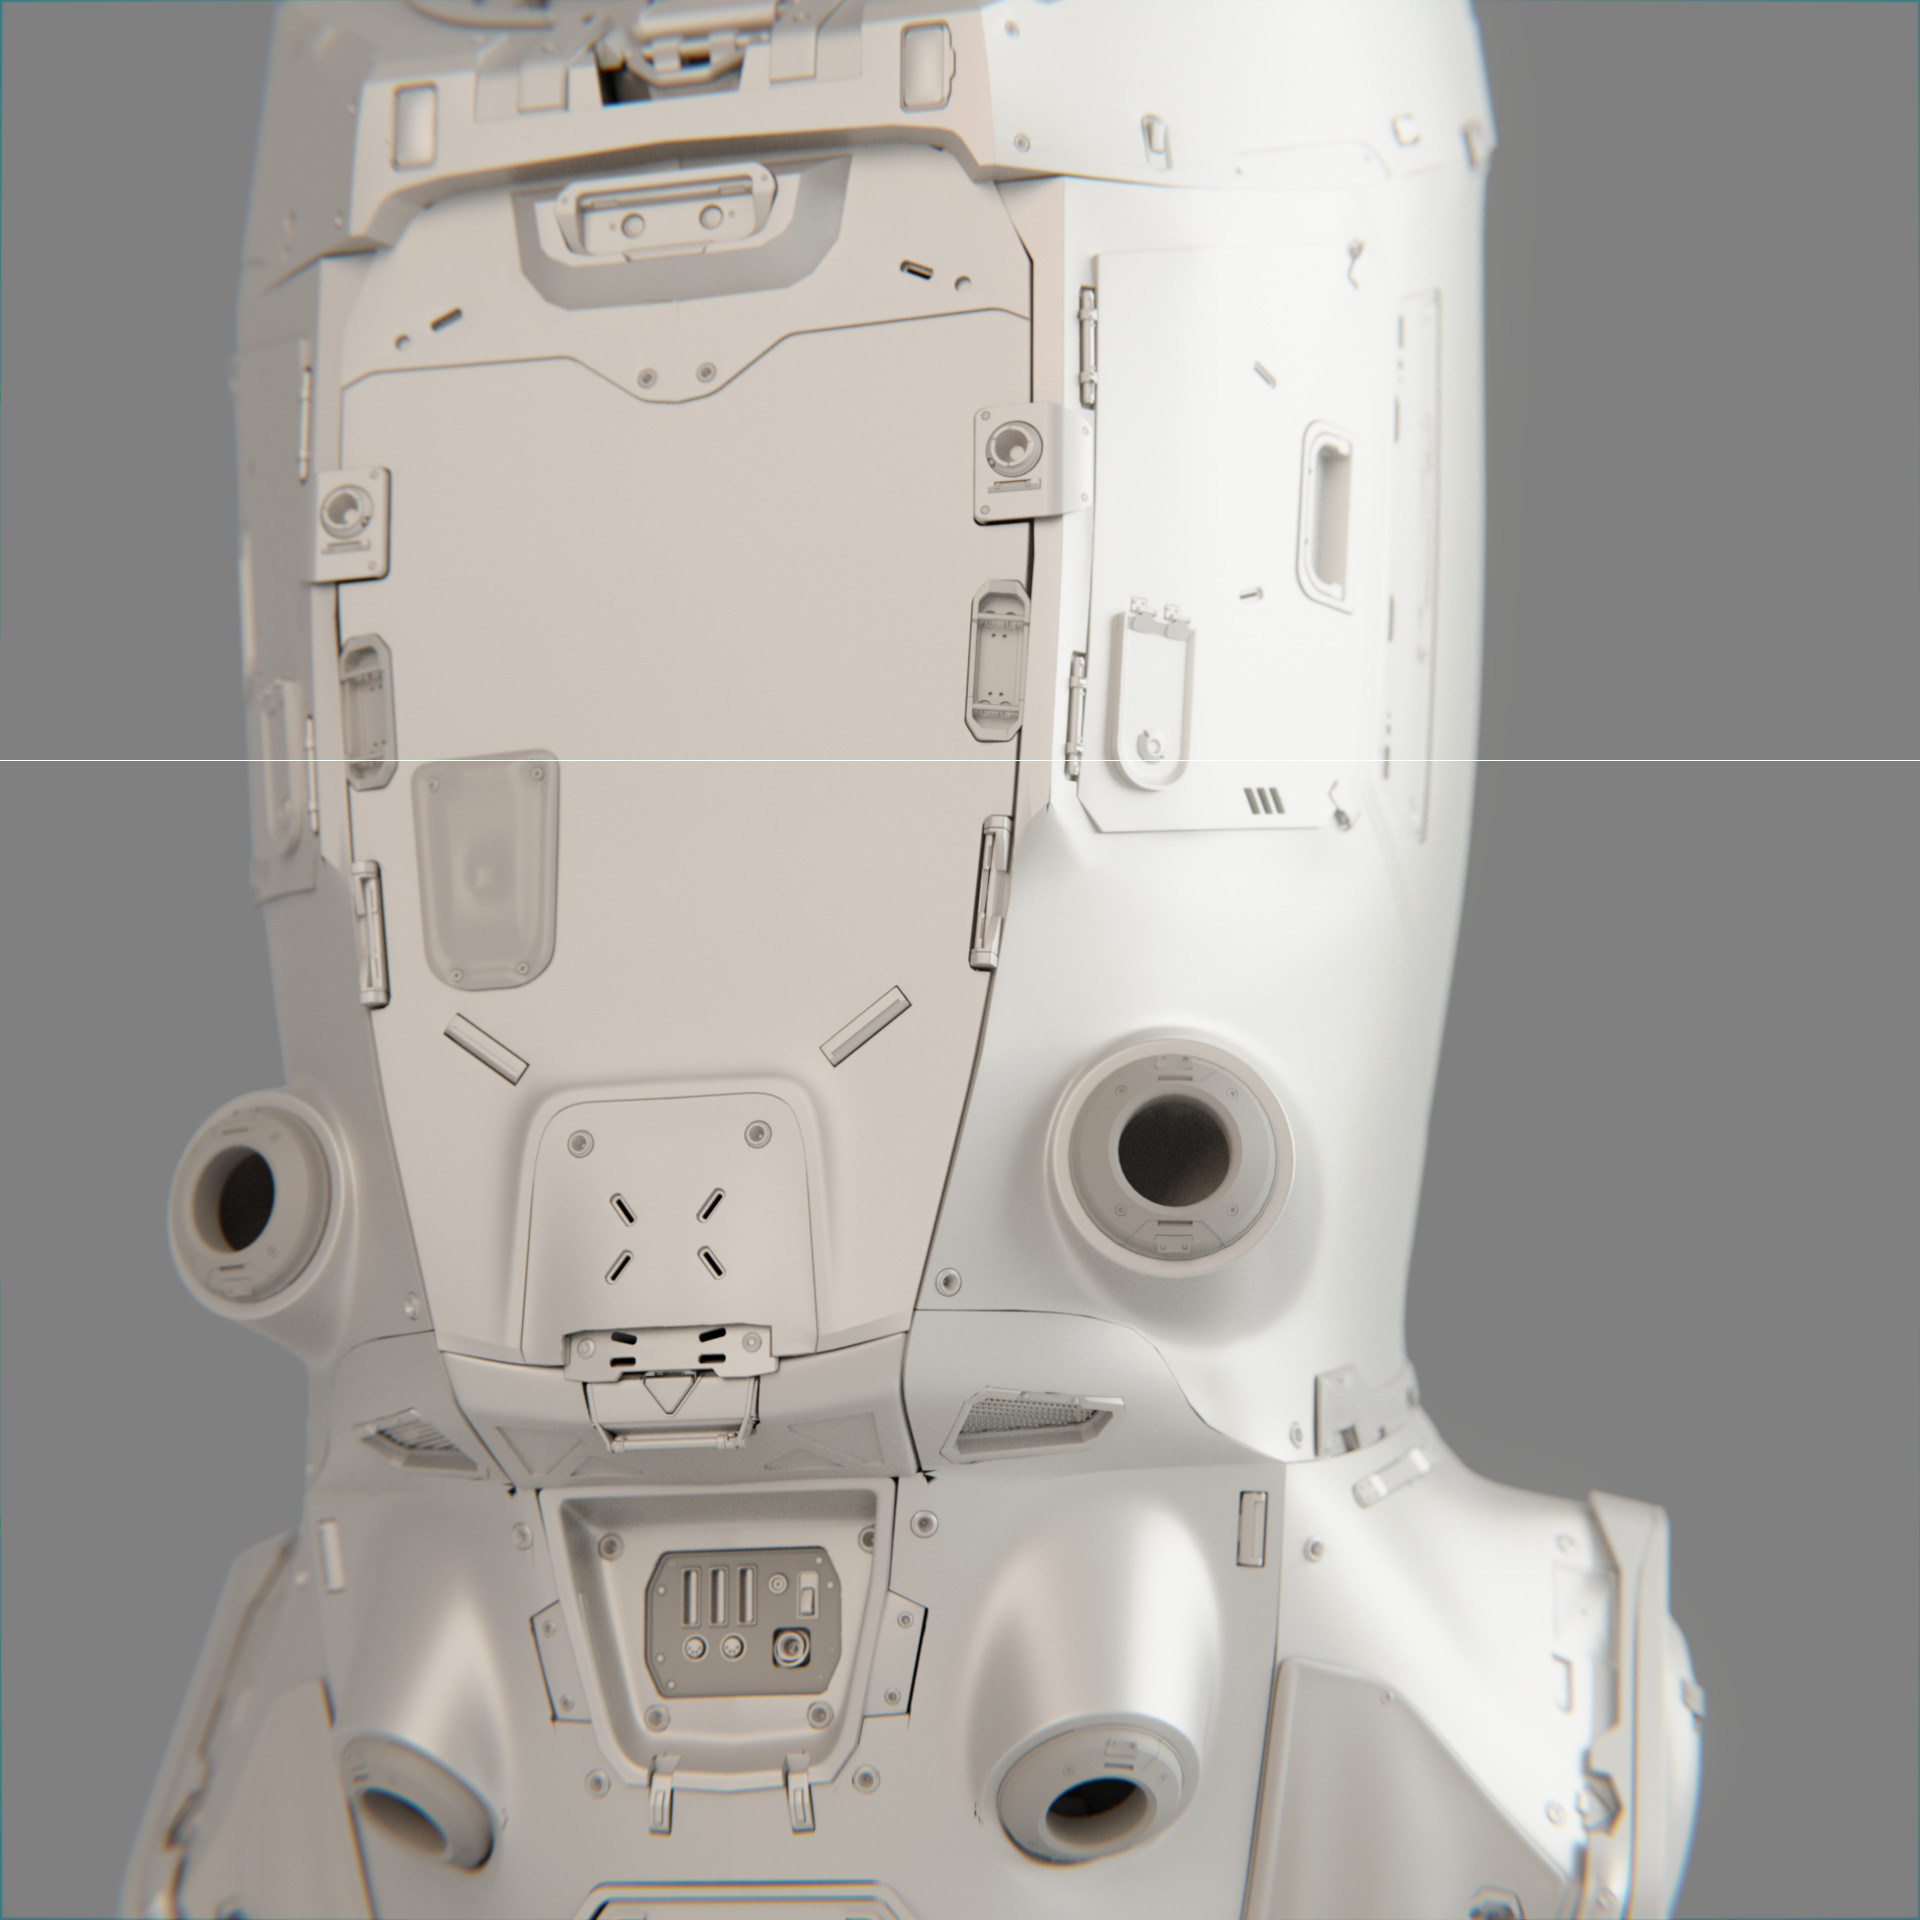 Victor duarte camera 008